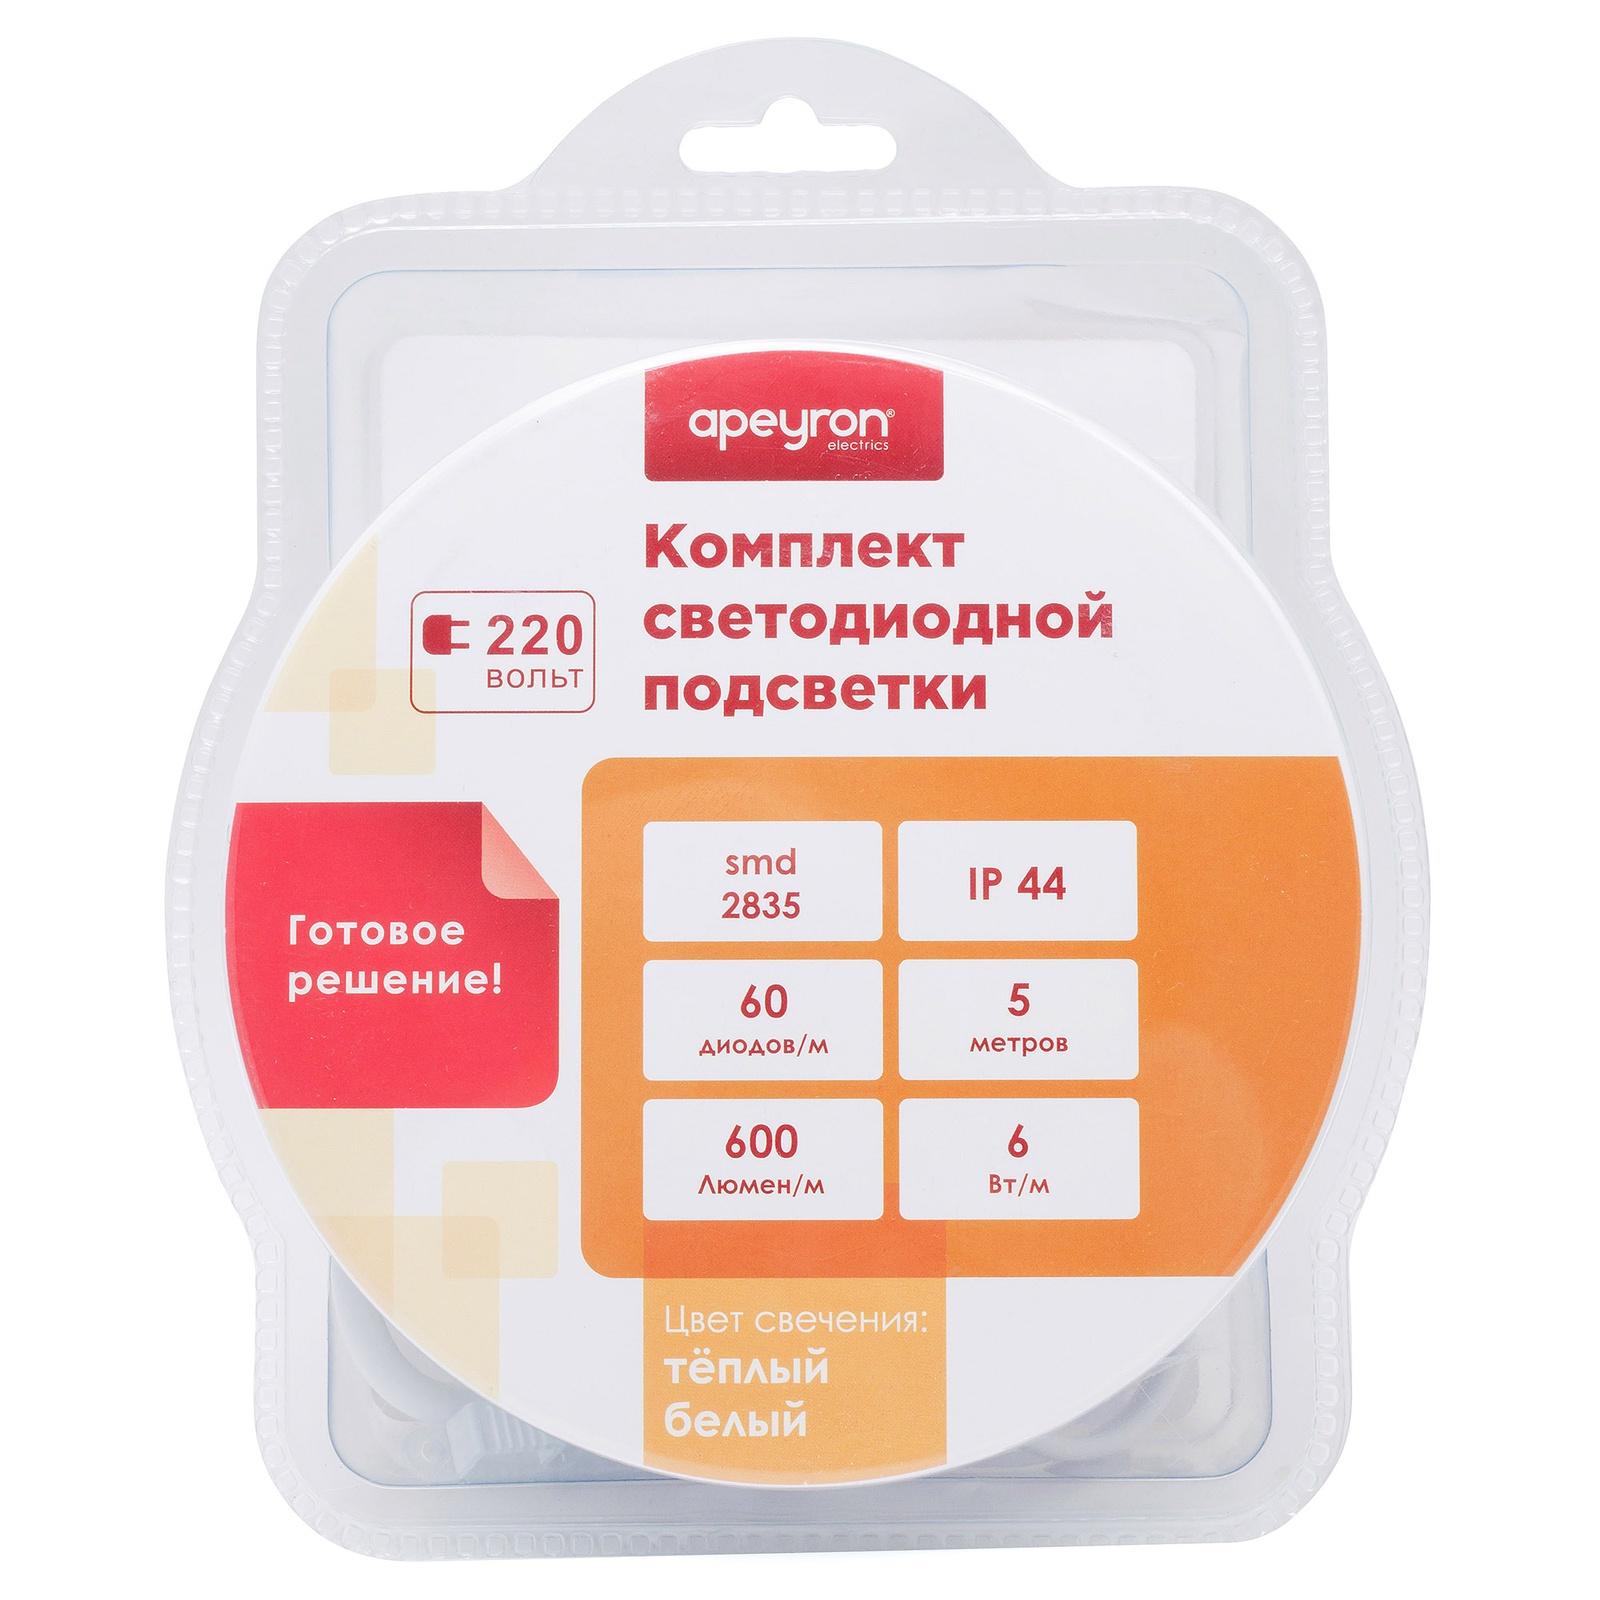 Светодиодная лента APEYRON electrics Комплект, 10-58 led лента 220в 6 5x17мм ip67 smd 5730 120 led м теплый белый 100м